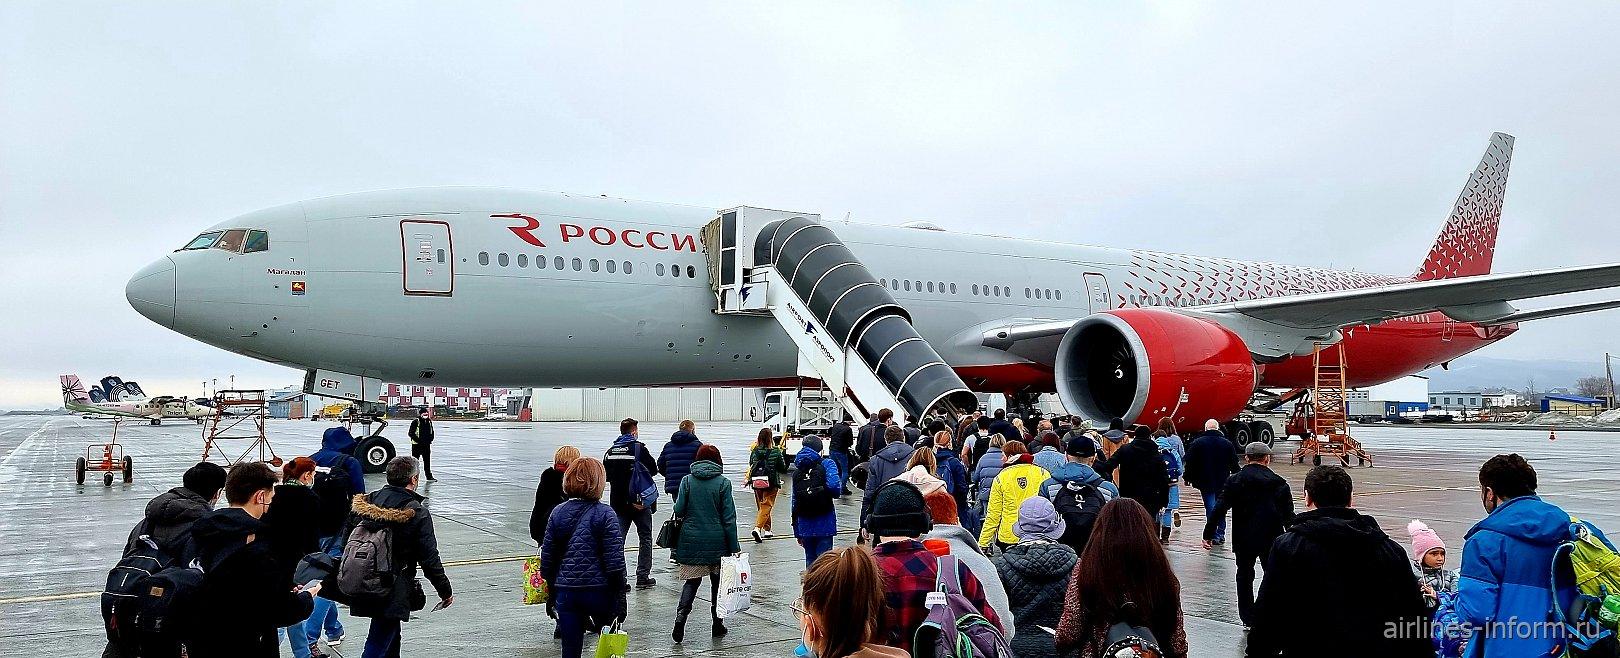 "Южно-Сахалинск (UUS) - Москва (SVO) Boeing 777-300 EI-GET ""Магадан"" а/к Россия (эконом)."